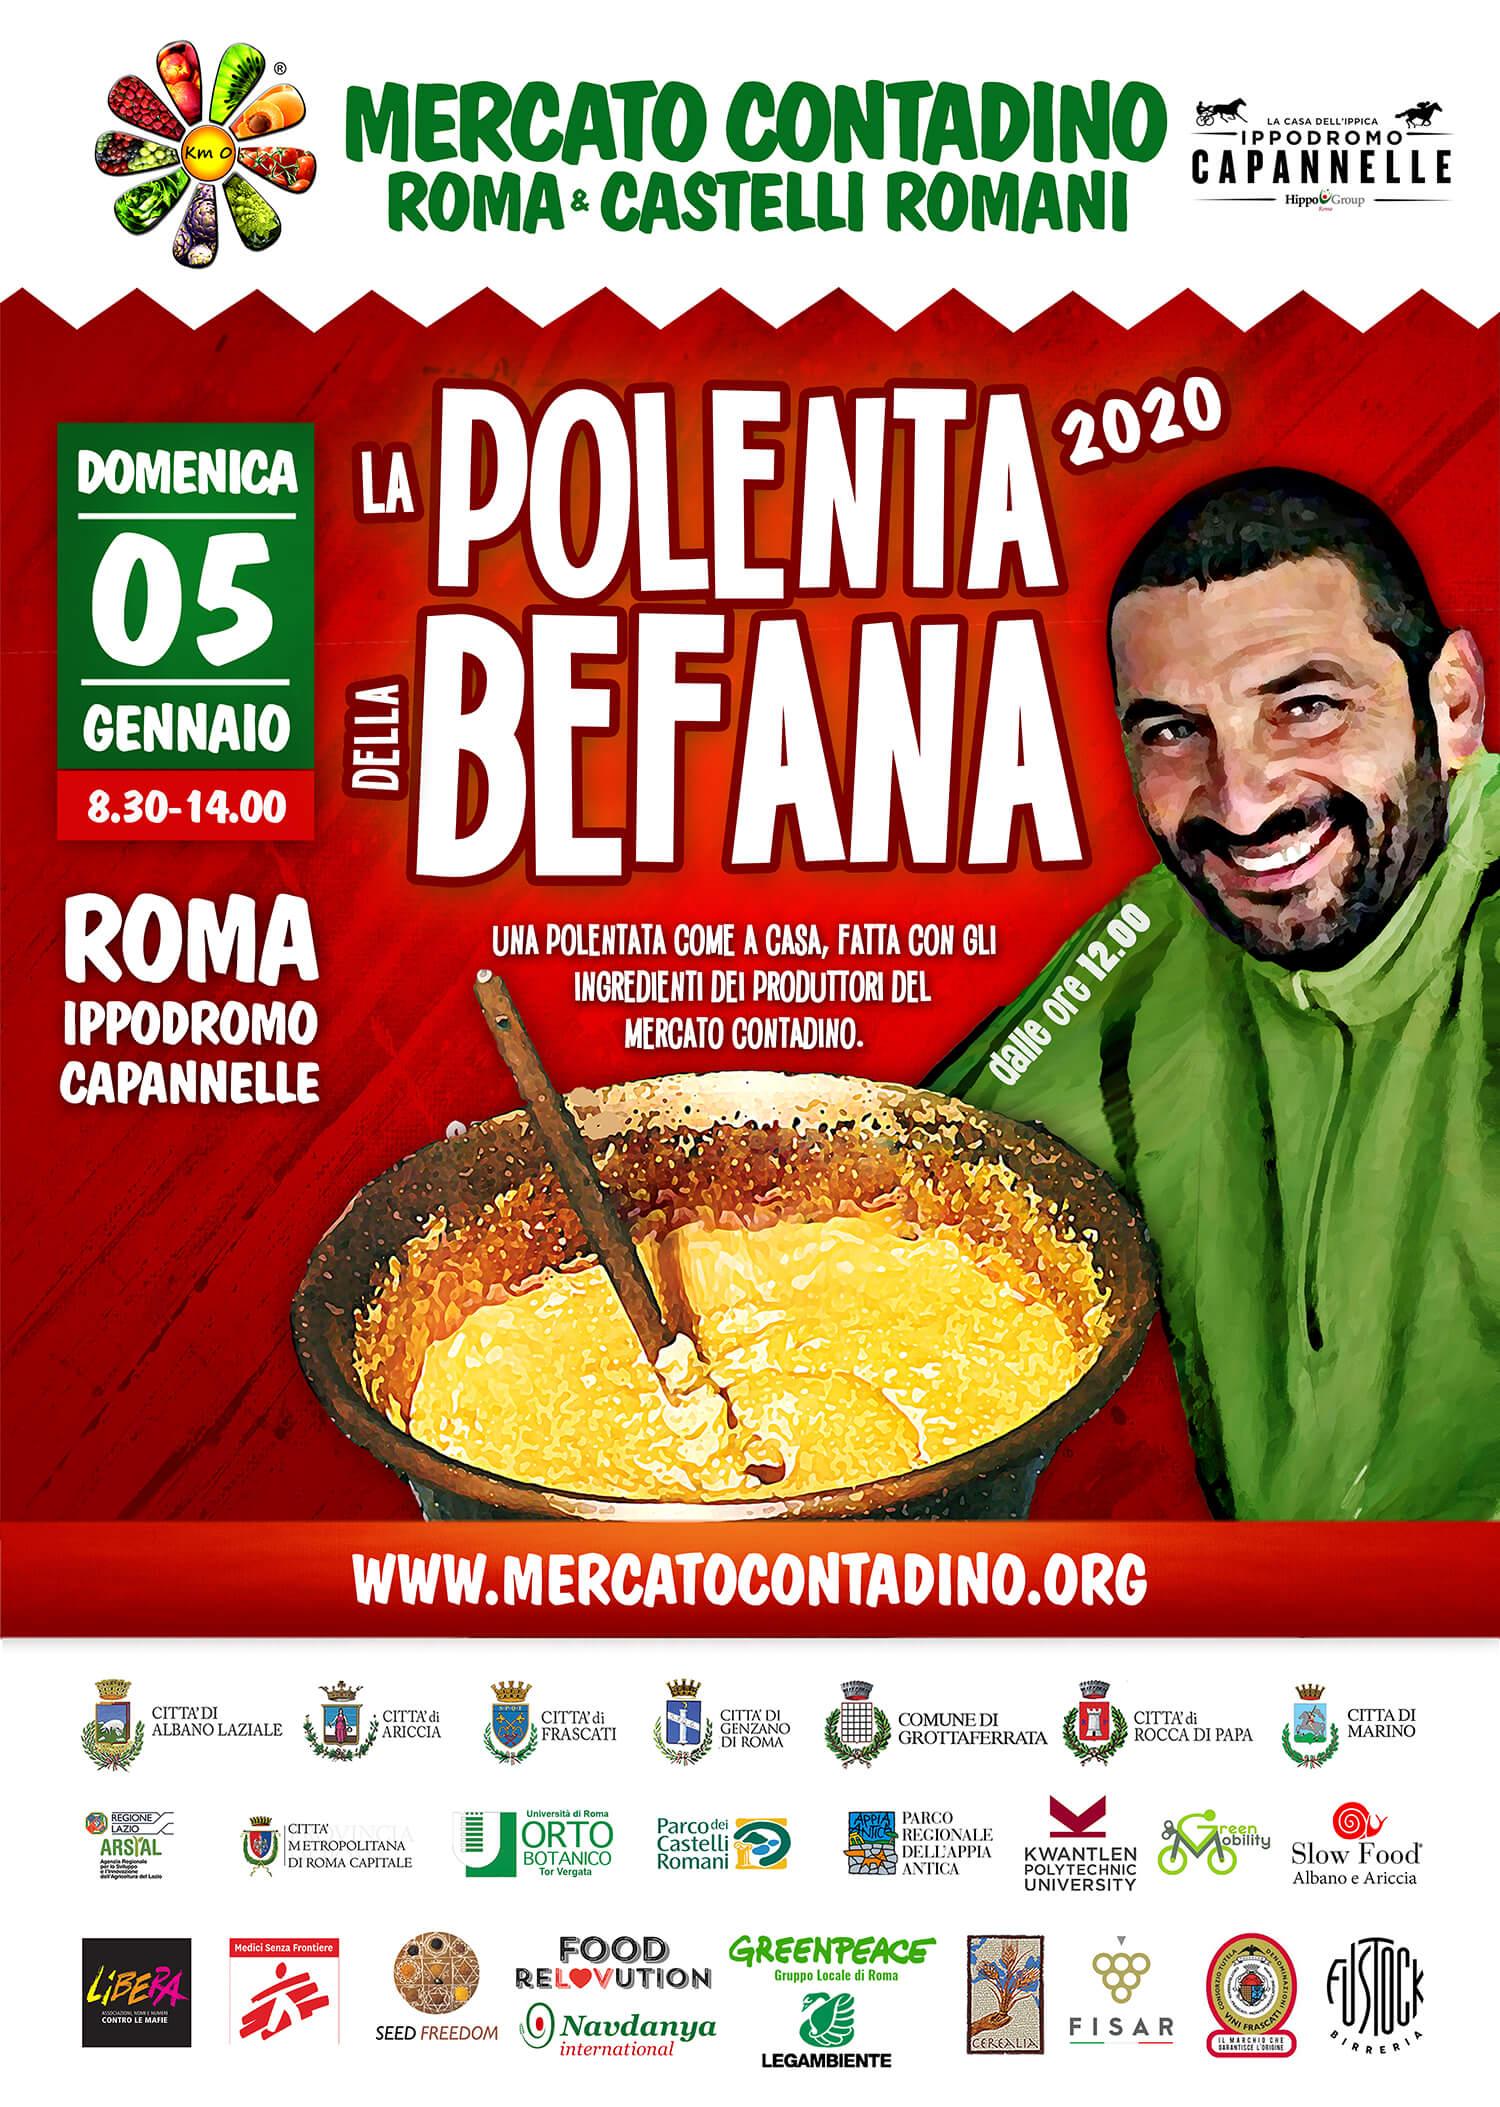 CAPANNELLE POLENTA MERCATO